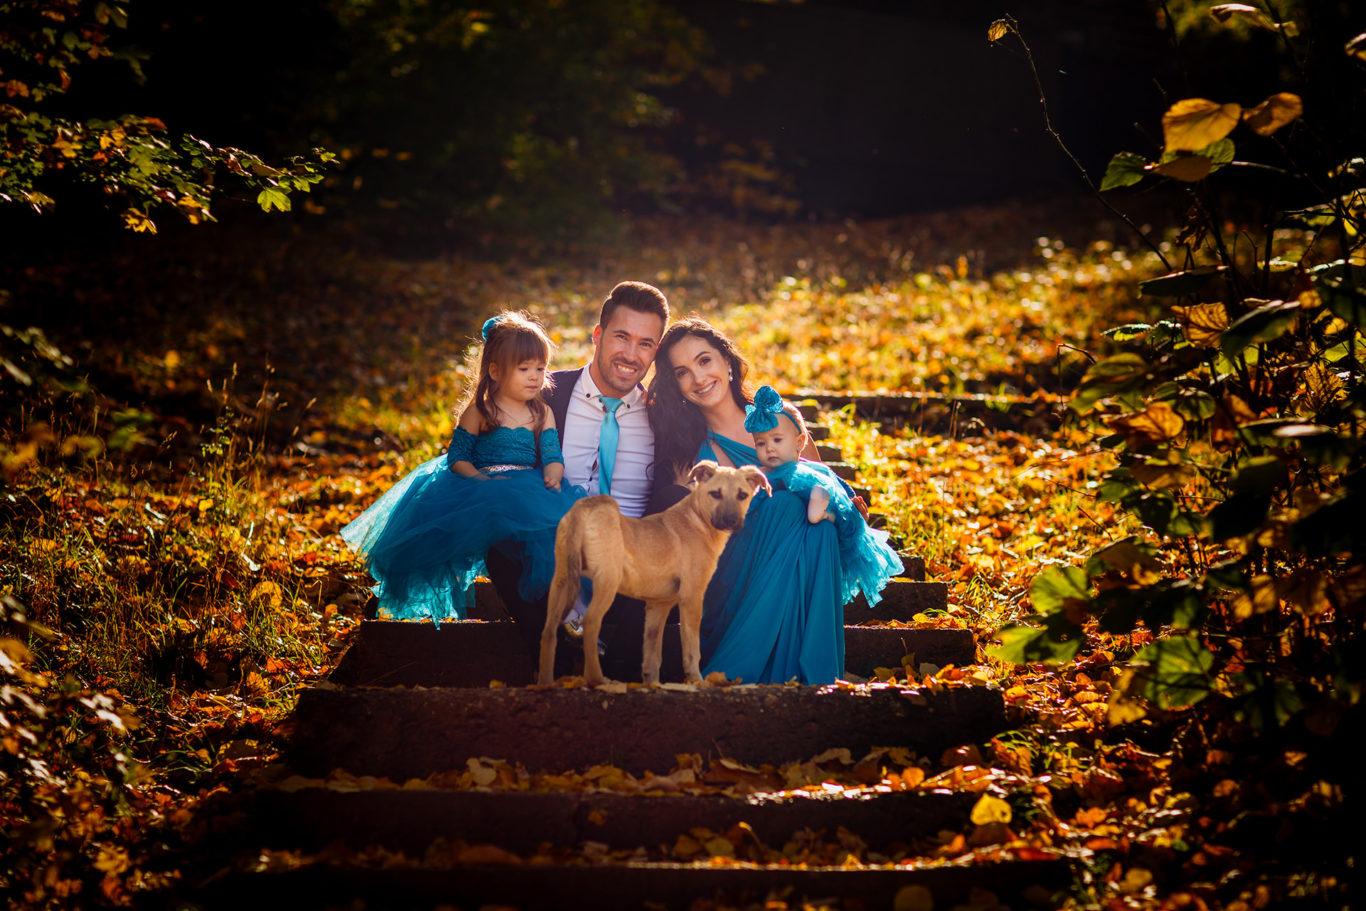 Sesiune foto familie in culori de toamna - Alice family - fotograf familie - Ciprian Dumitrescu - fotograf Bucuresti - fotograf profesionist